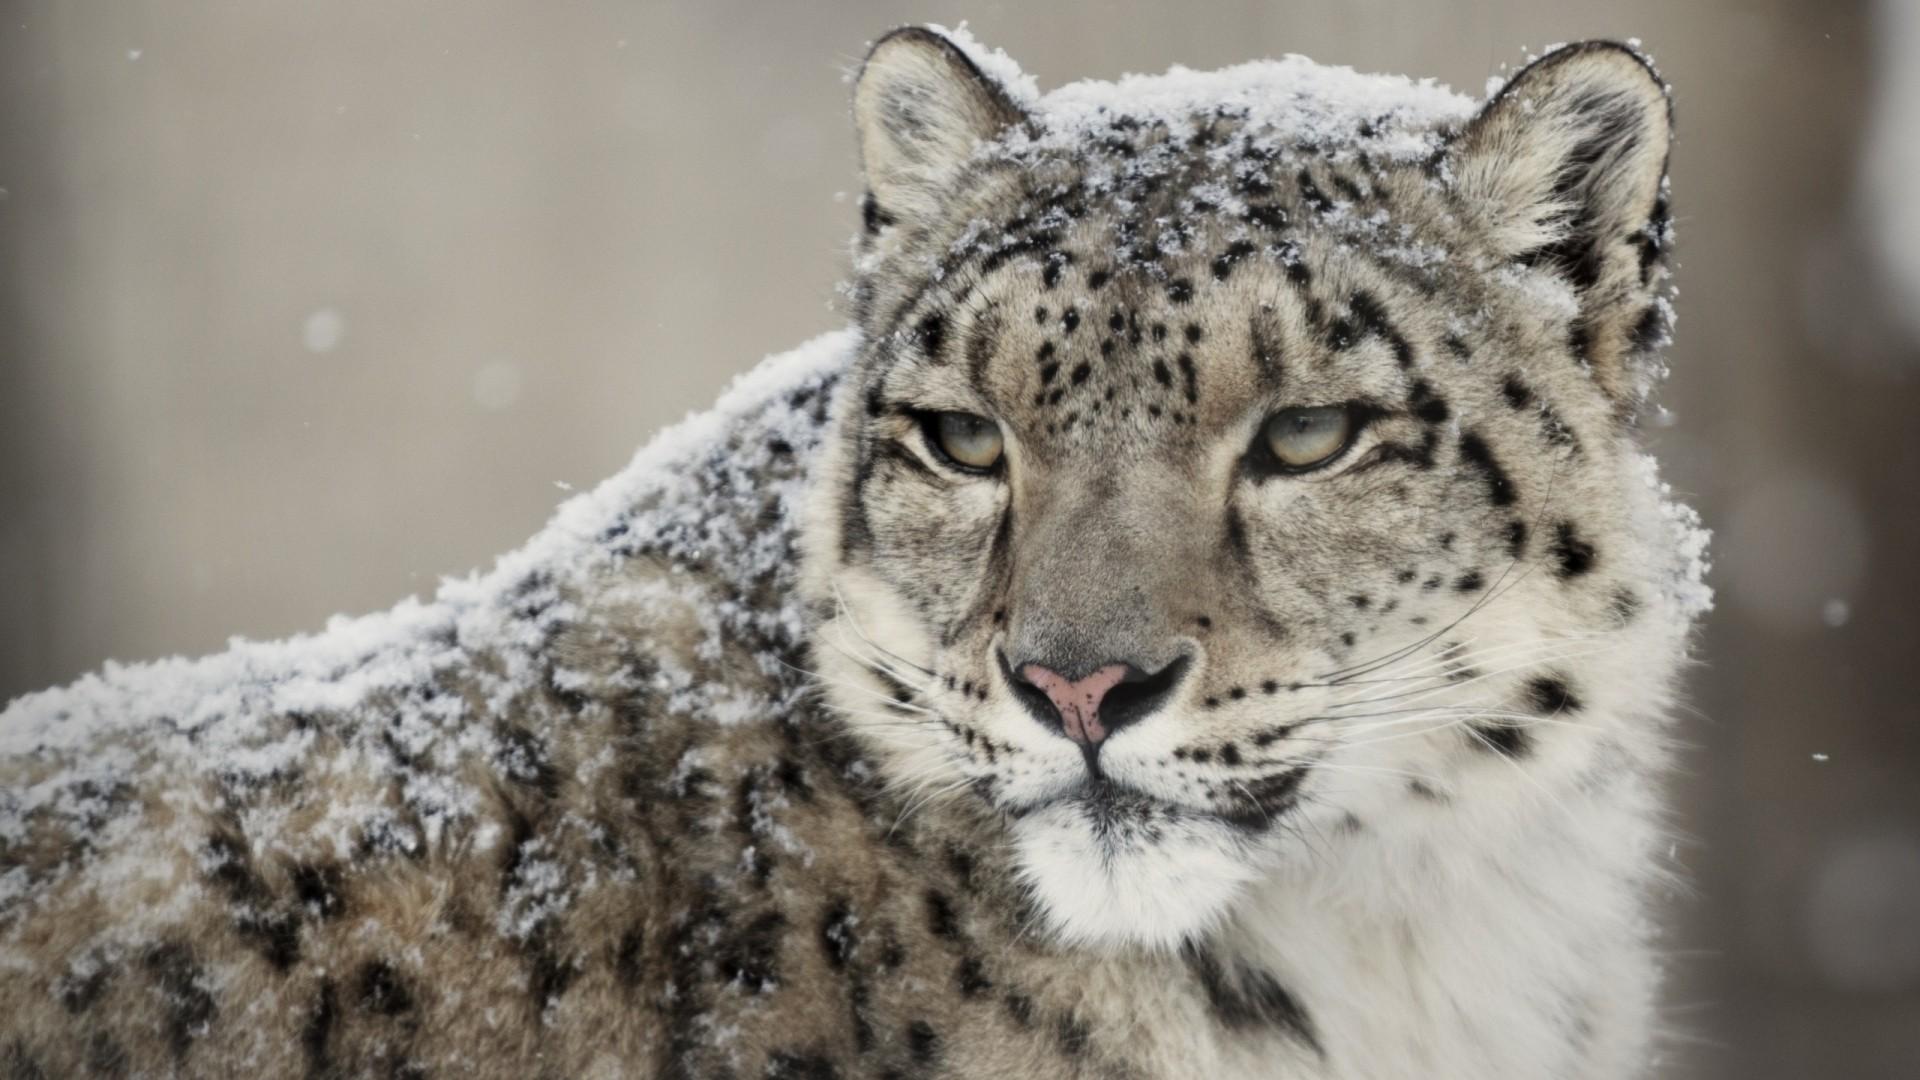 Snow Leopard hd wallpaper download